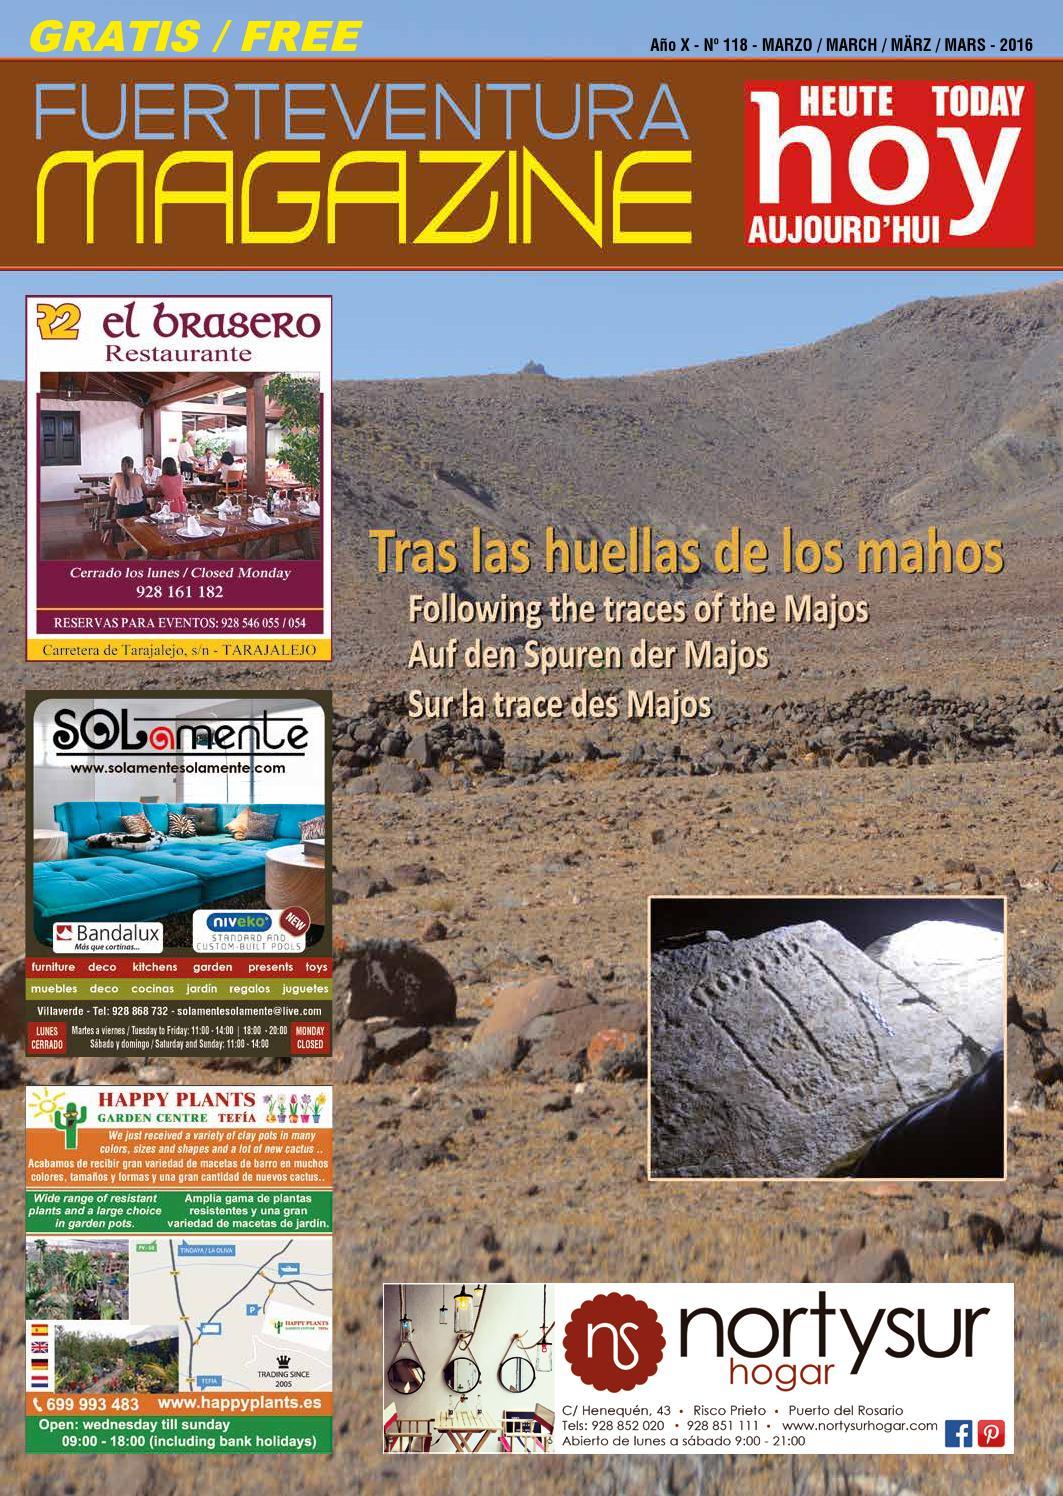 FUERTEVENTURA MAGAZINE HOY - Nº 118 - MARZO 2016 by Fuerteventura ...